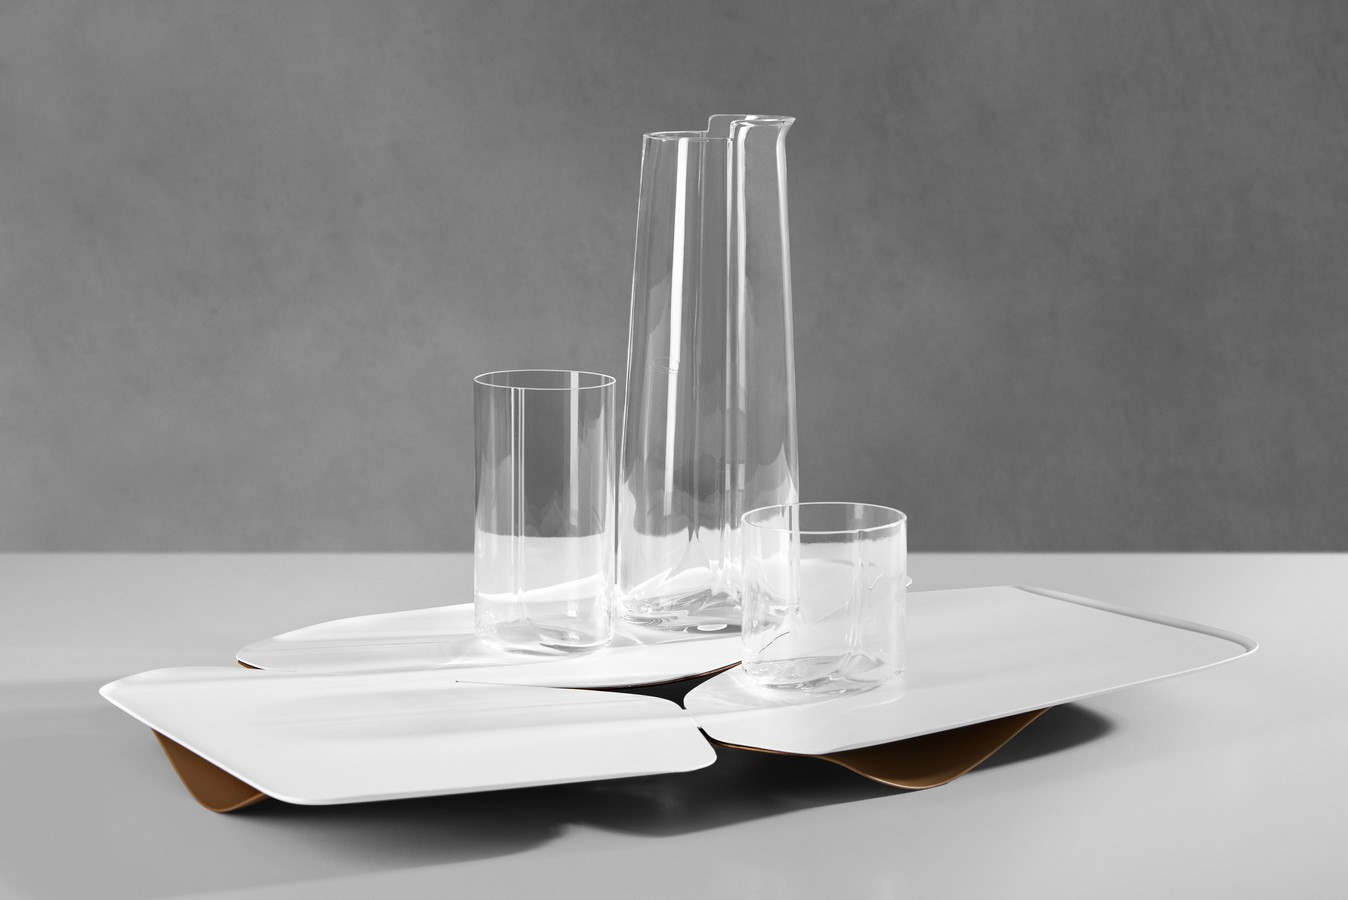 HEW TRAY & GLASSWARE - Sheet1